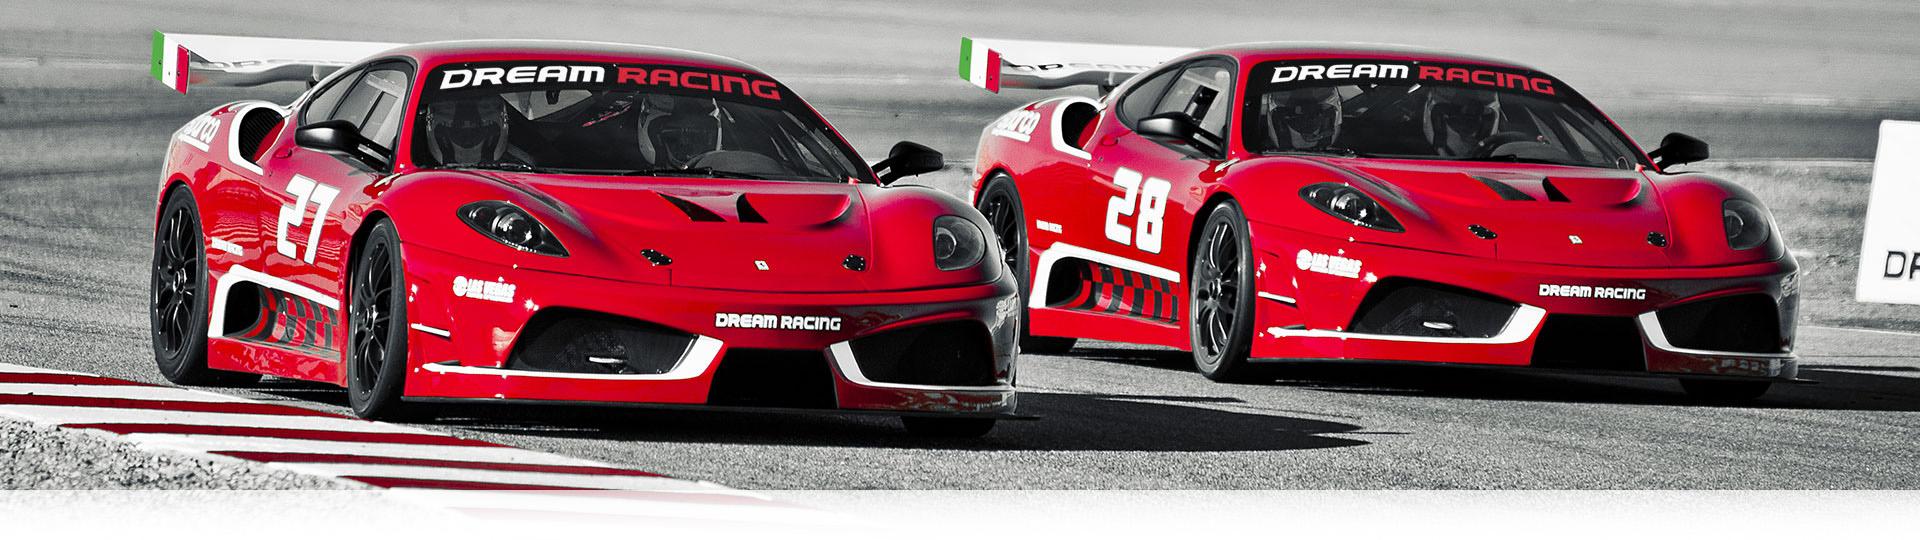 Dream Racing Disclaimer Dream Racing